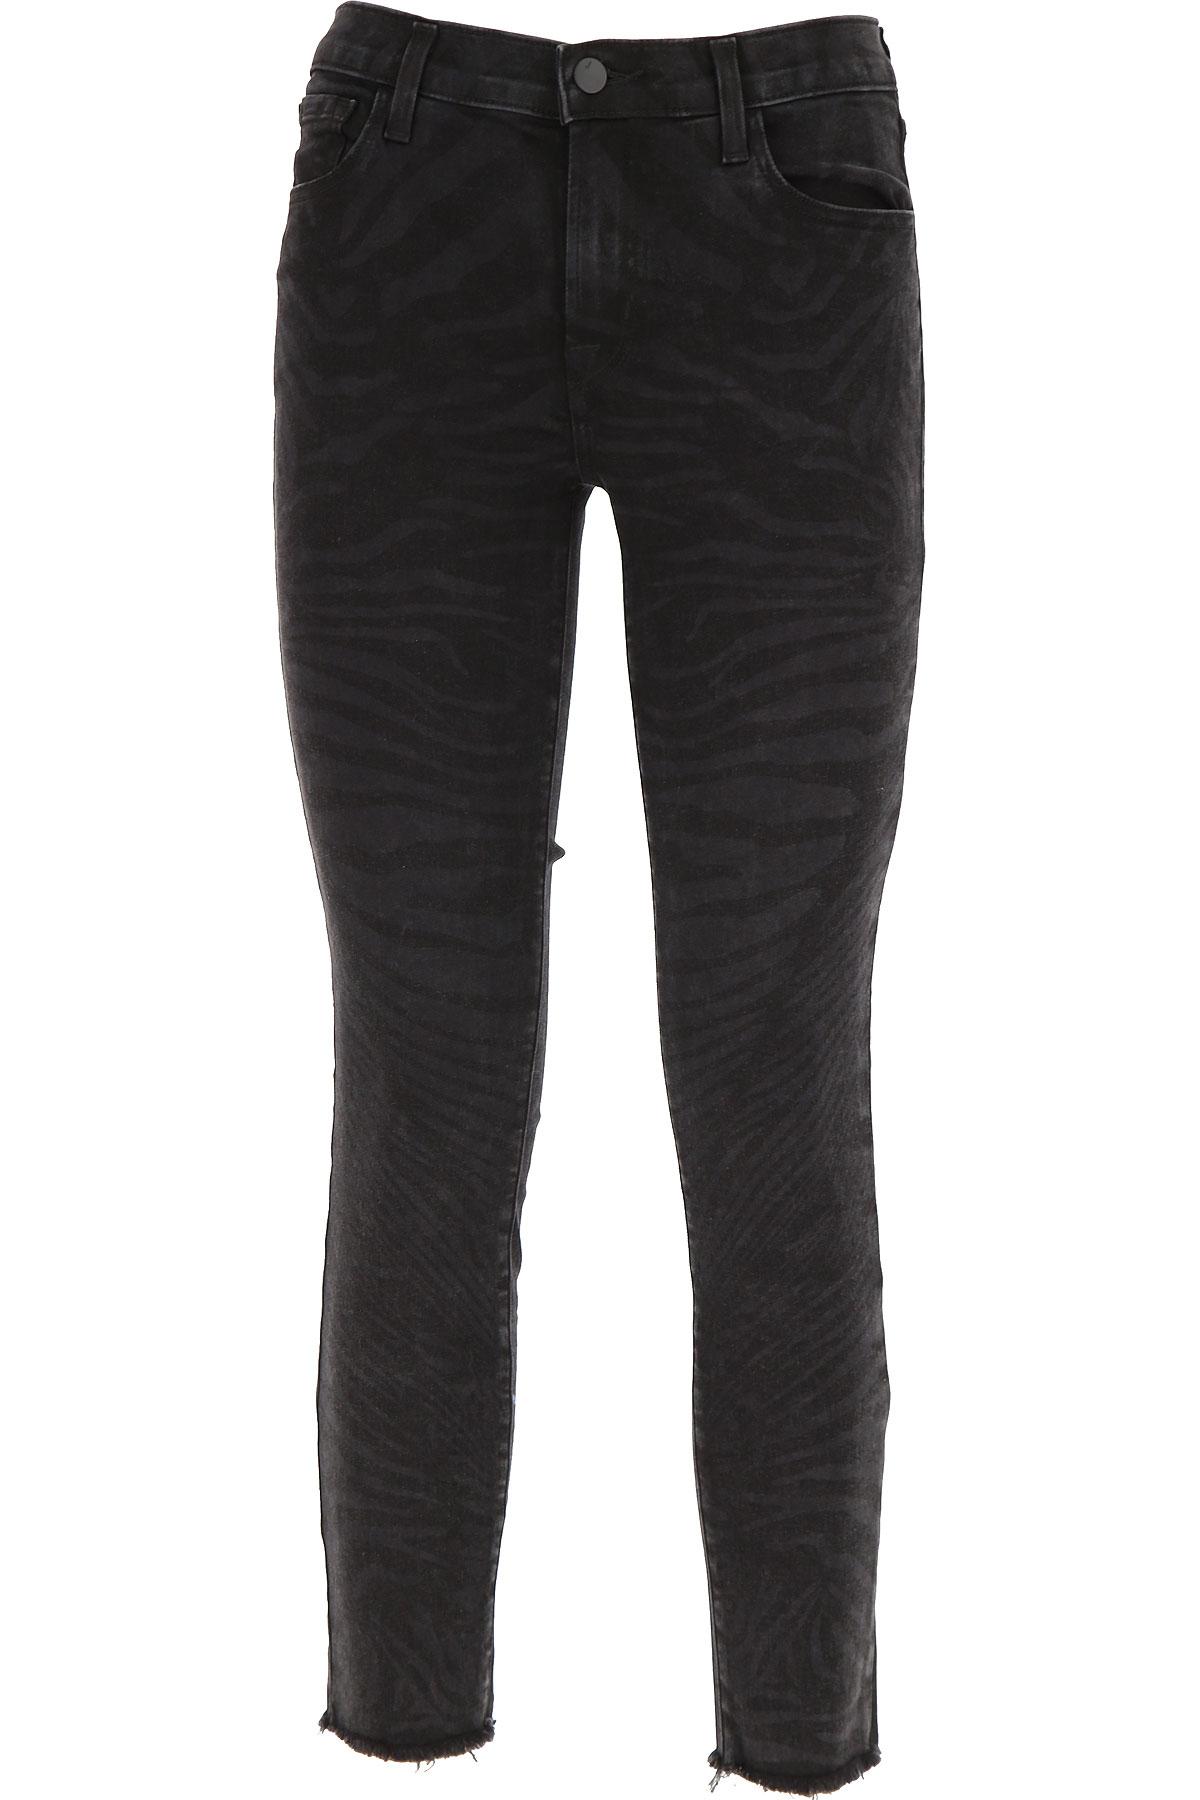 J Brand Jeans On Sale, Black, Cotton, 2019, 25 26